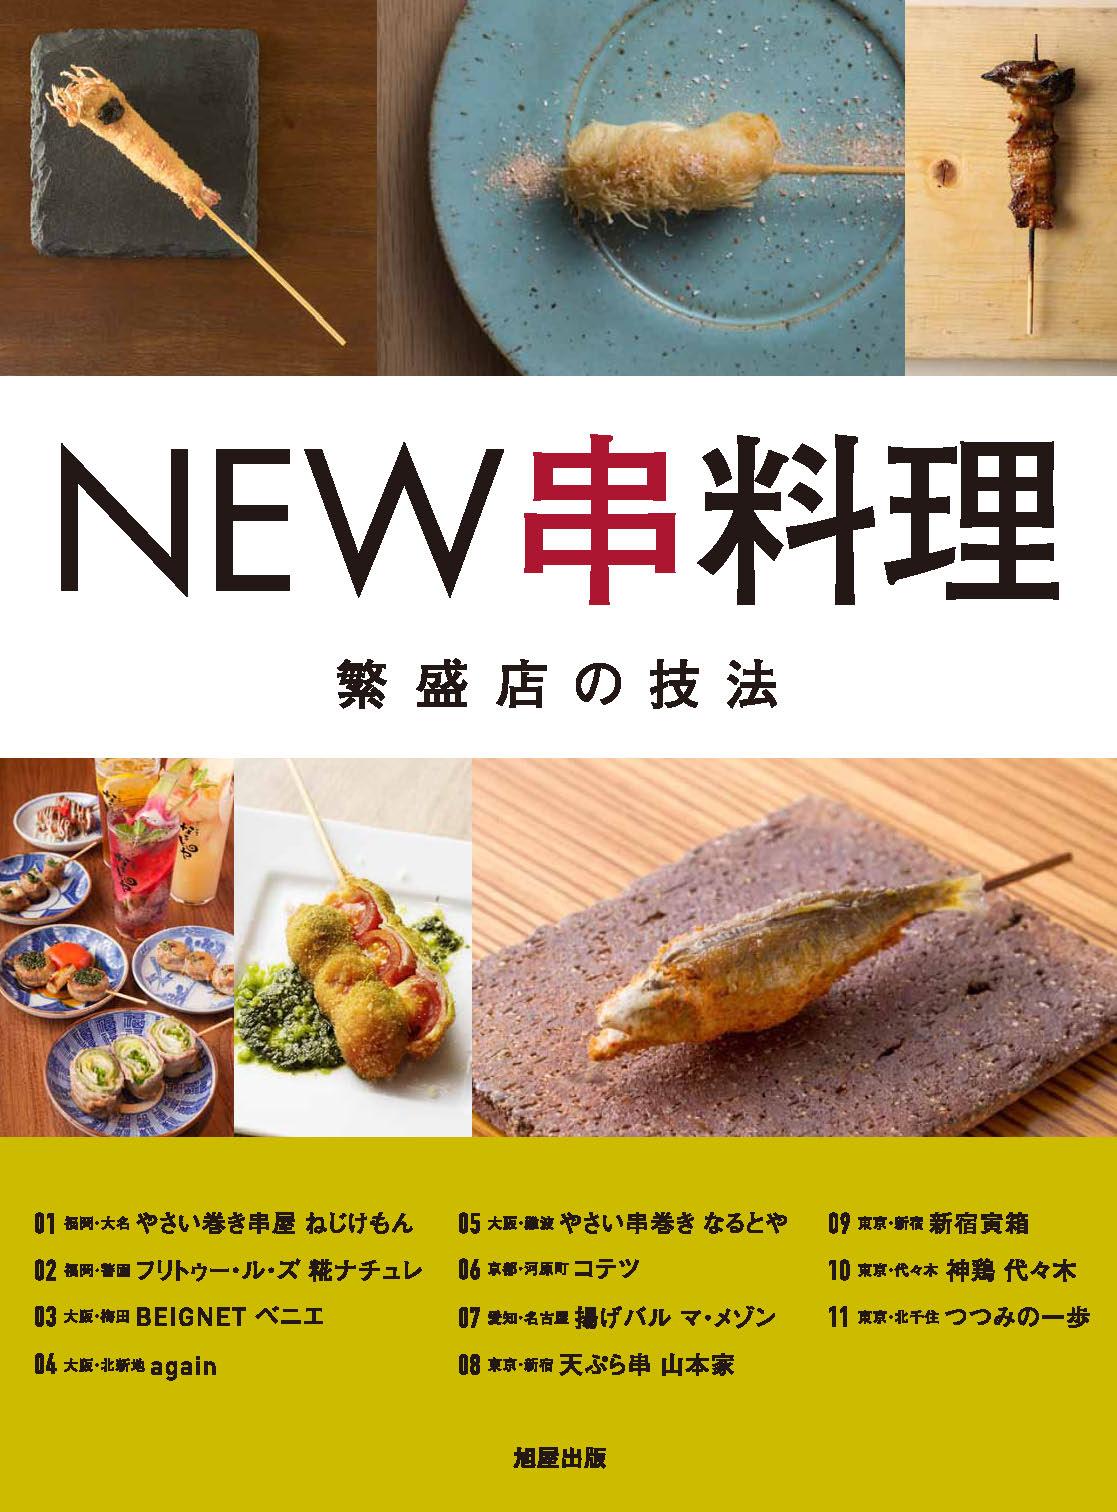 繁盛店の技法 NEW串料理